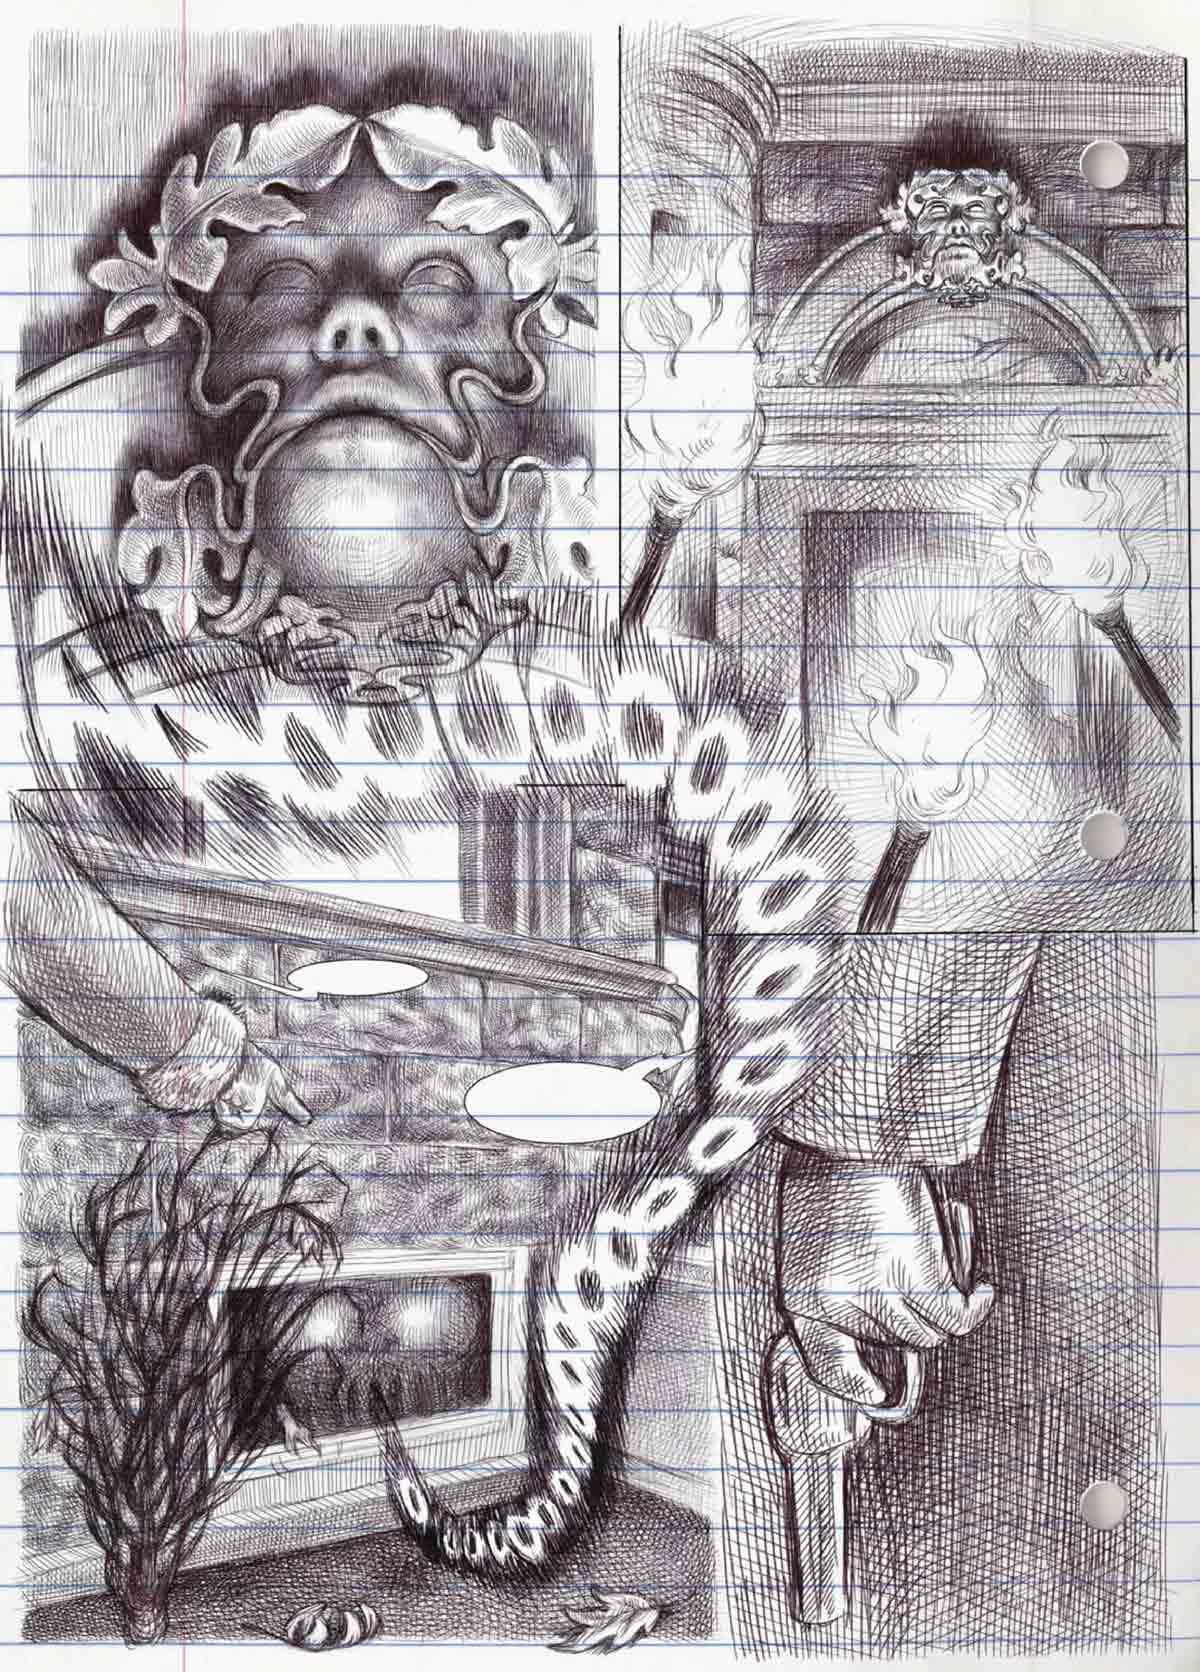 Golem-Comics-comic-Lo-que-mas-me-gusta-son-los-Monstruos-Emil-ferris-06